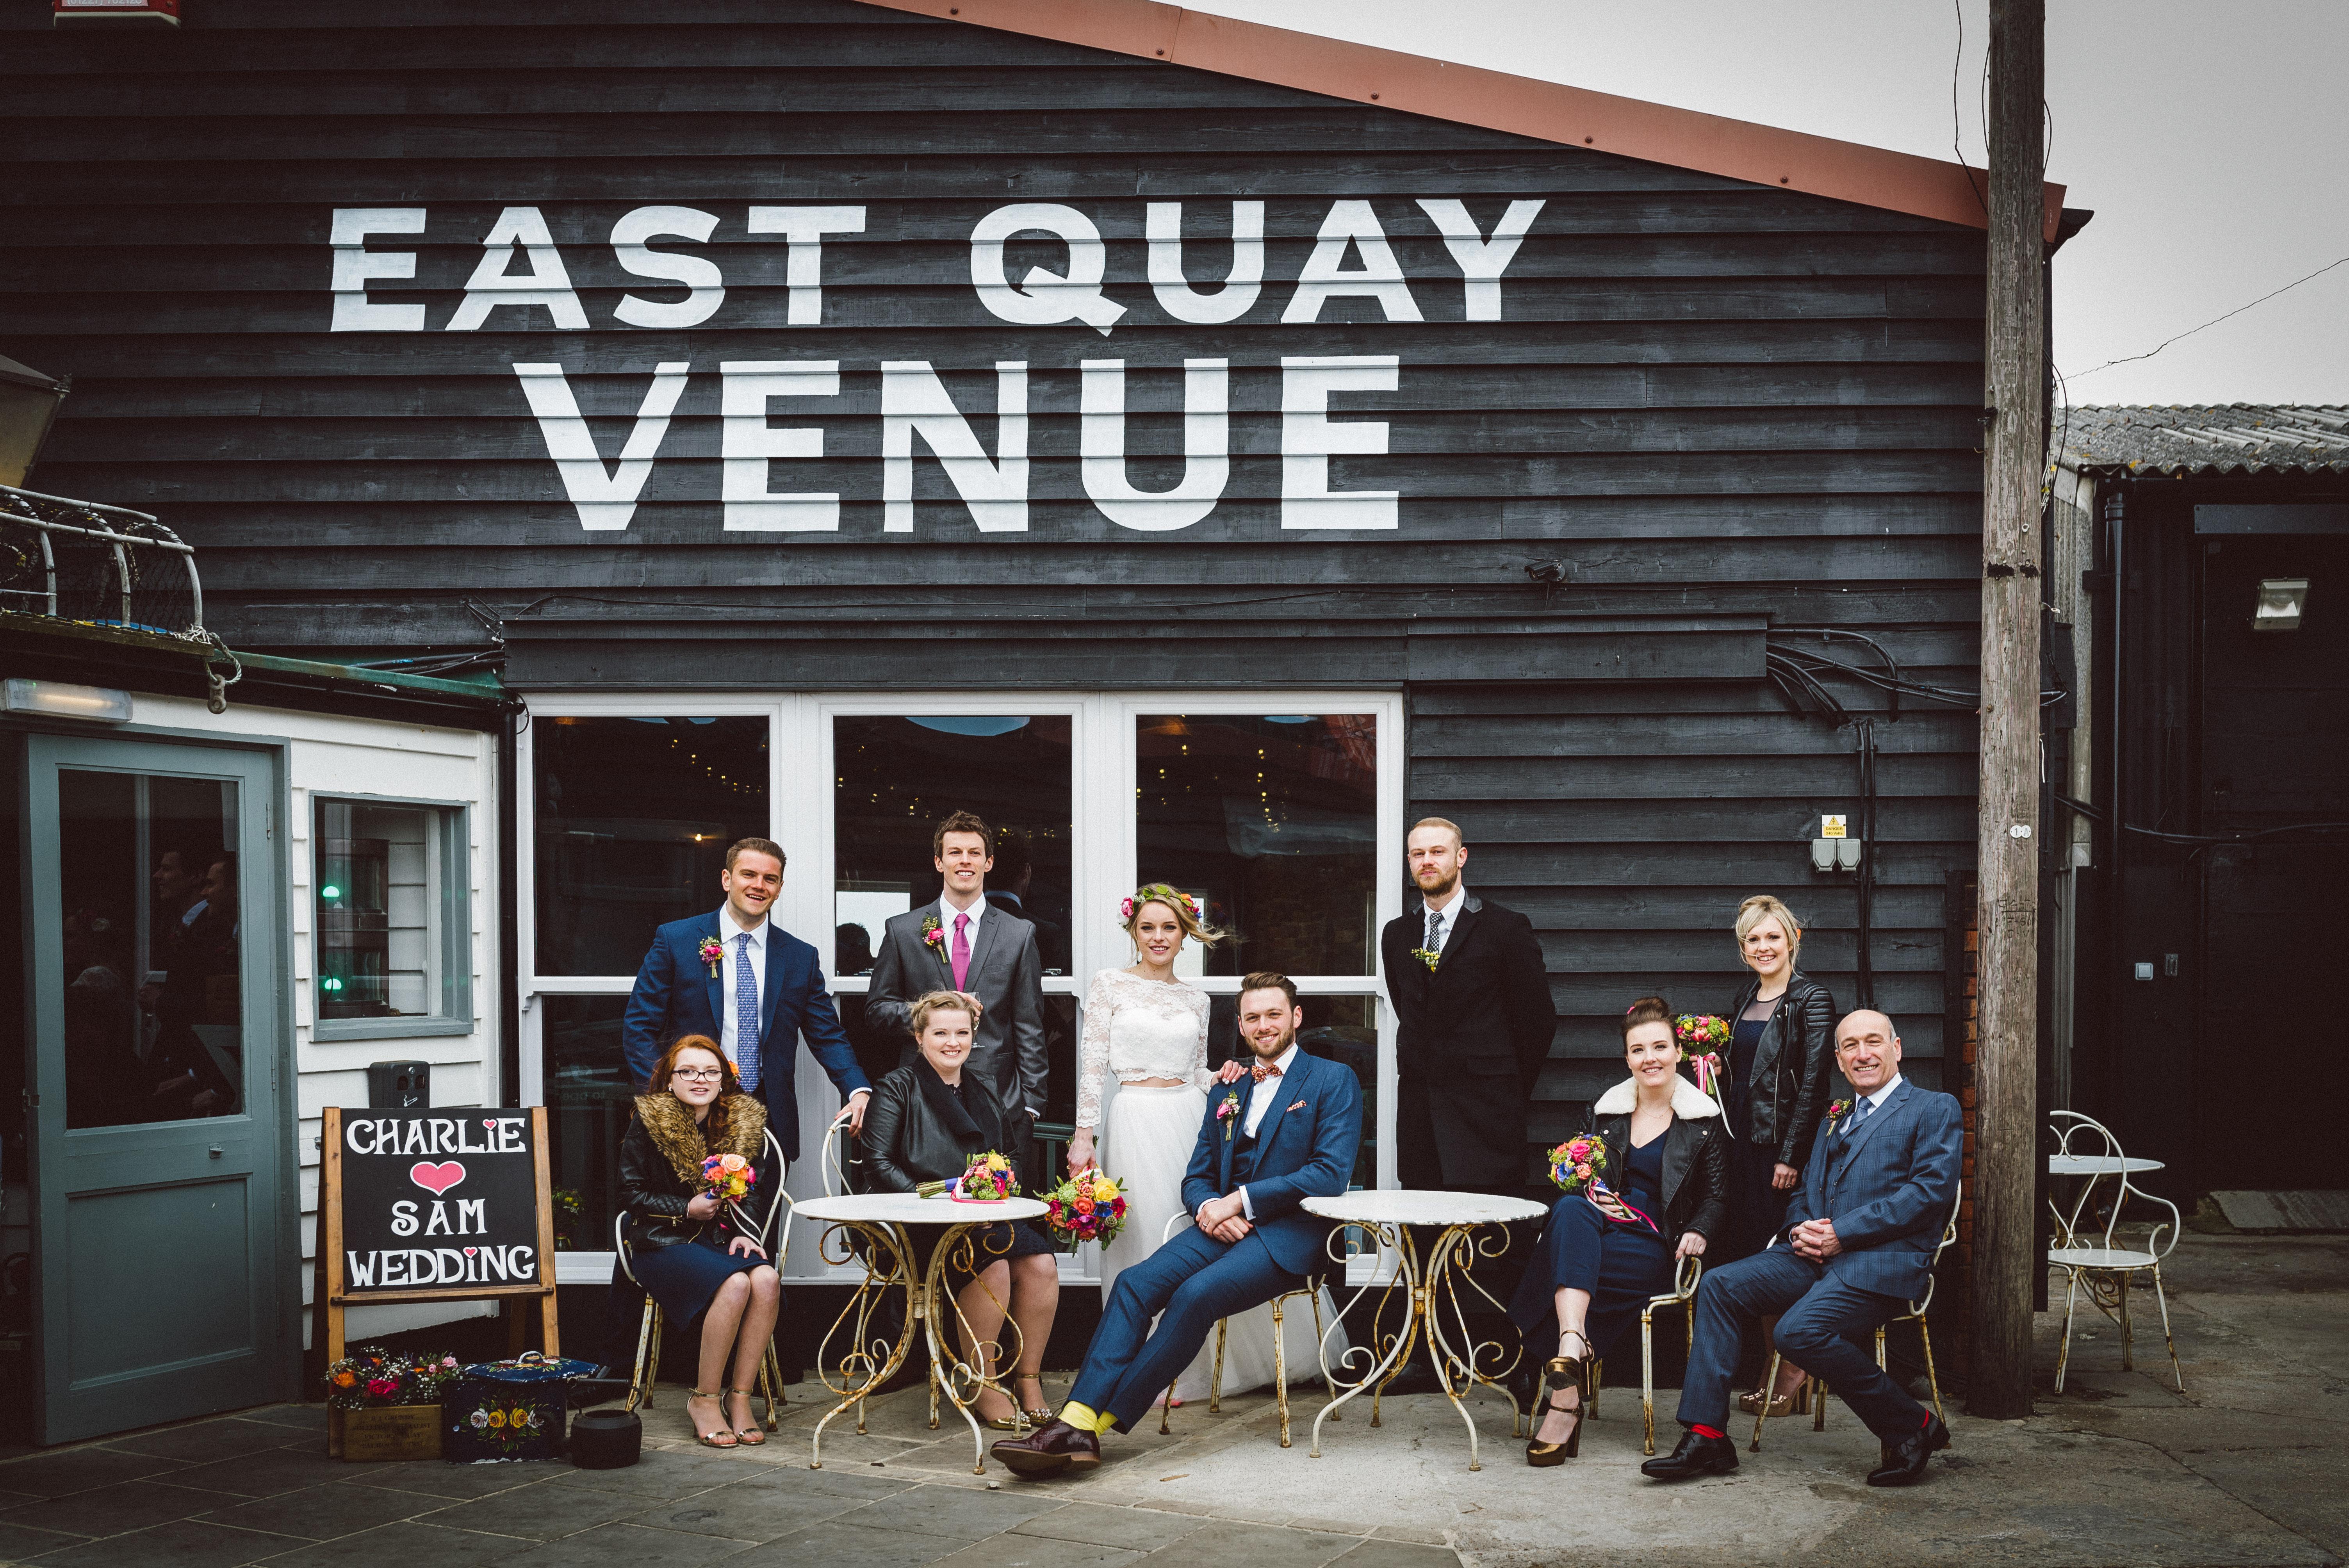 Beachside wedding venue hire Whitstable Kent